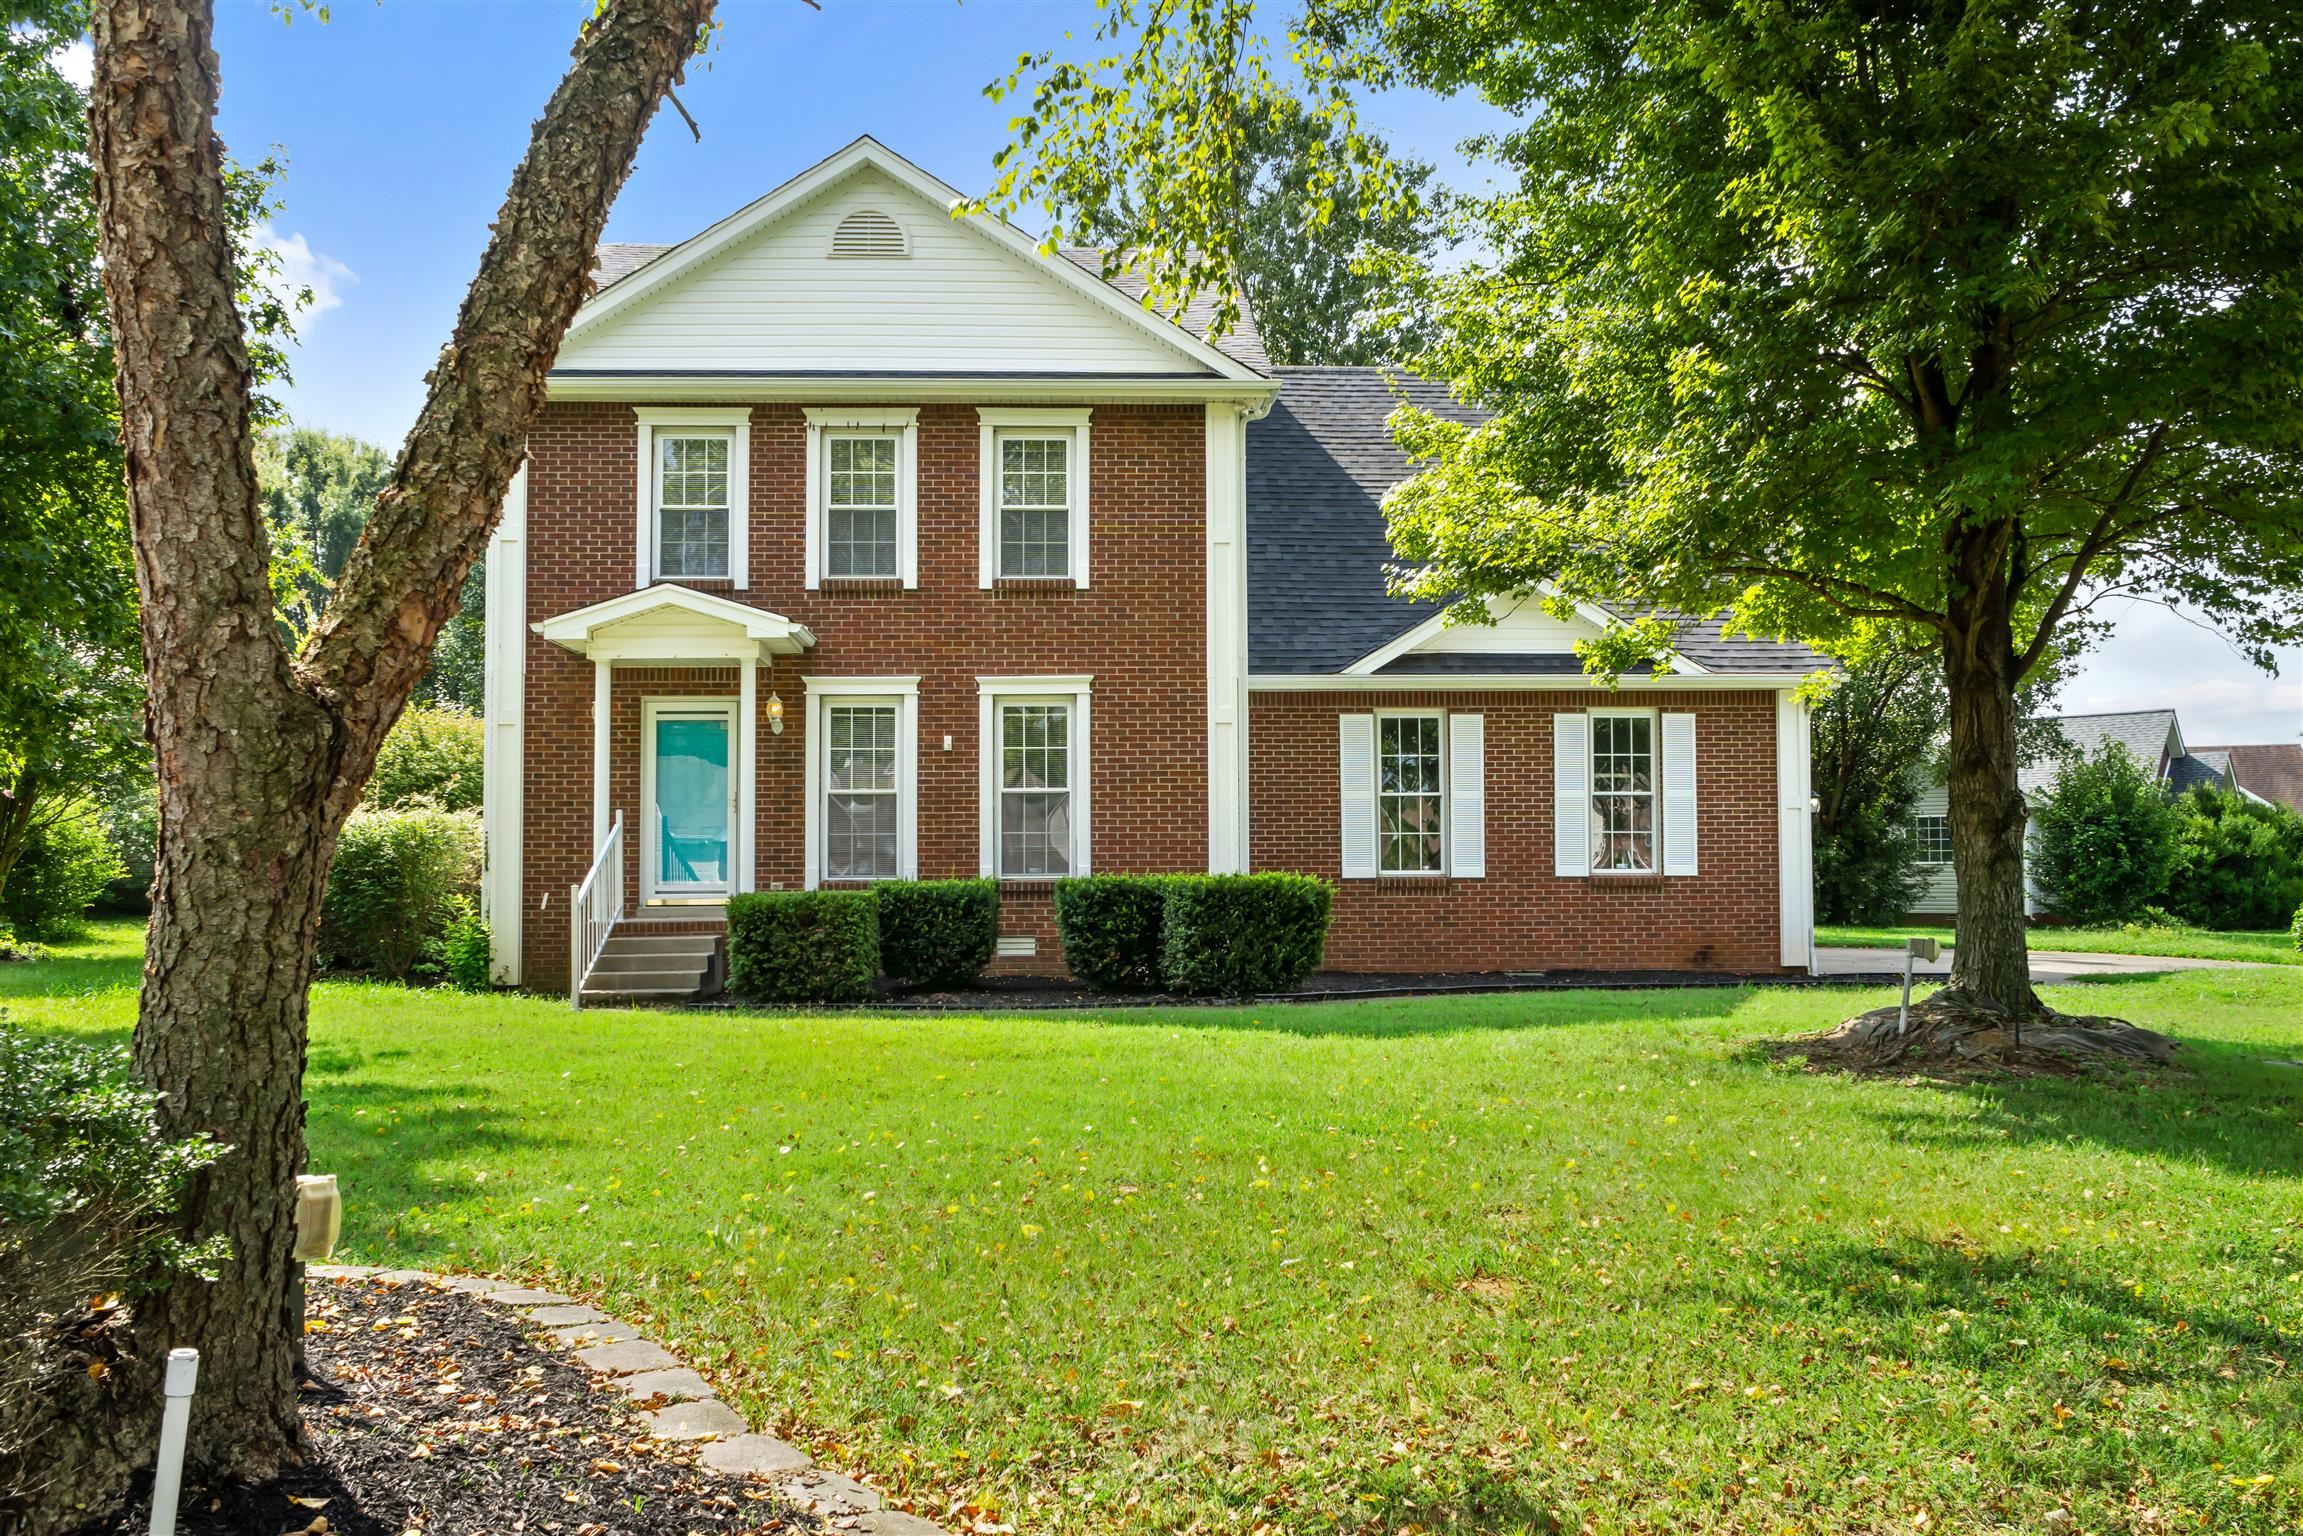 3997 Castle Bar, Clarksville, TN 37040 - Clarksville, TN real estate listing